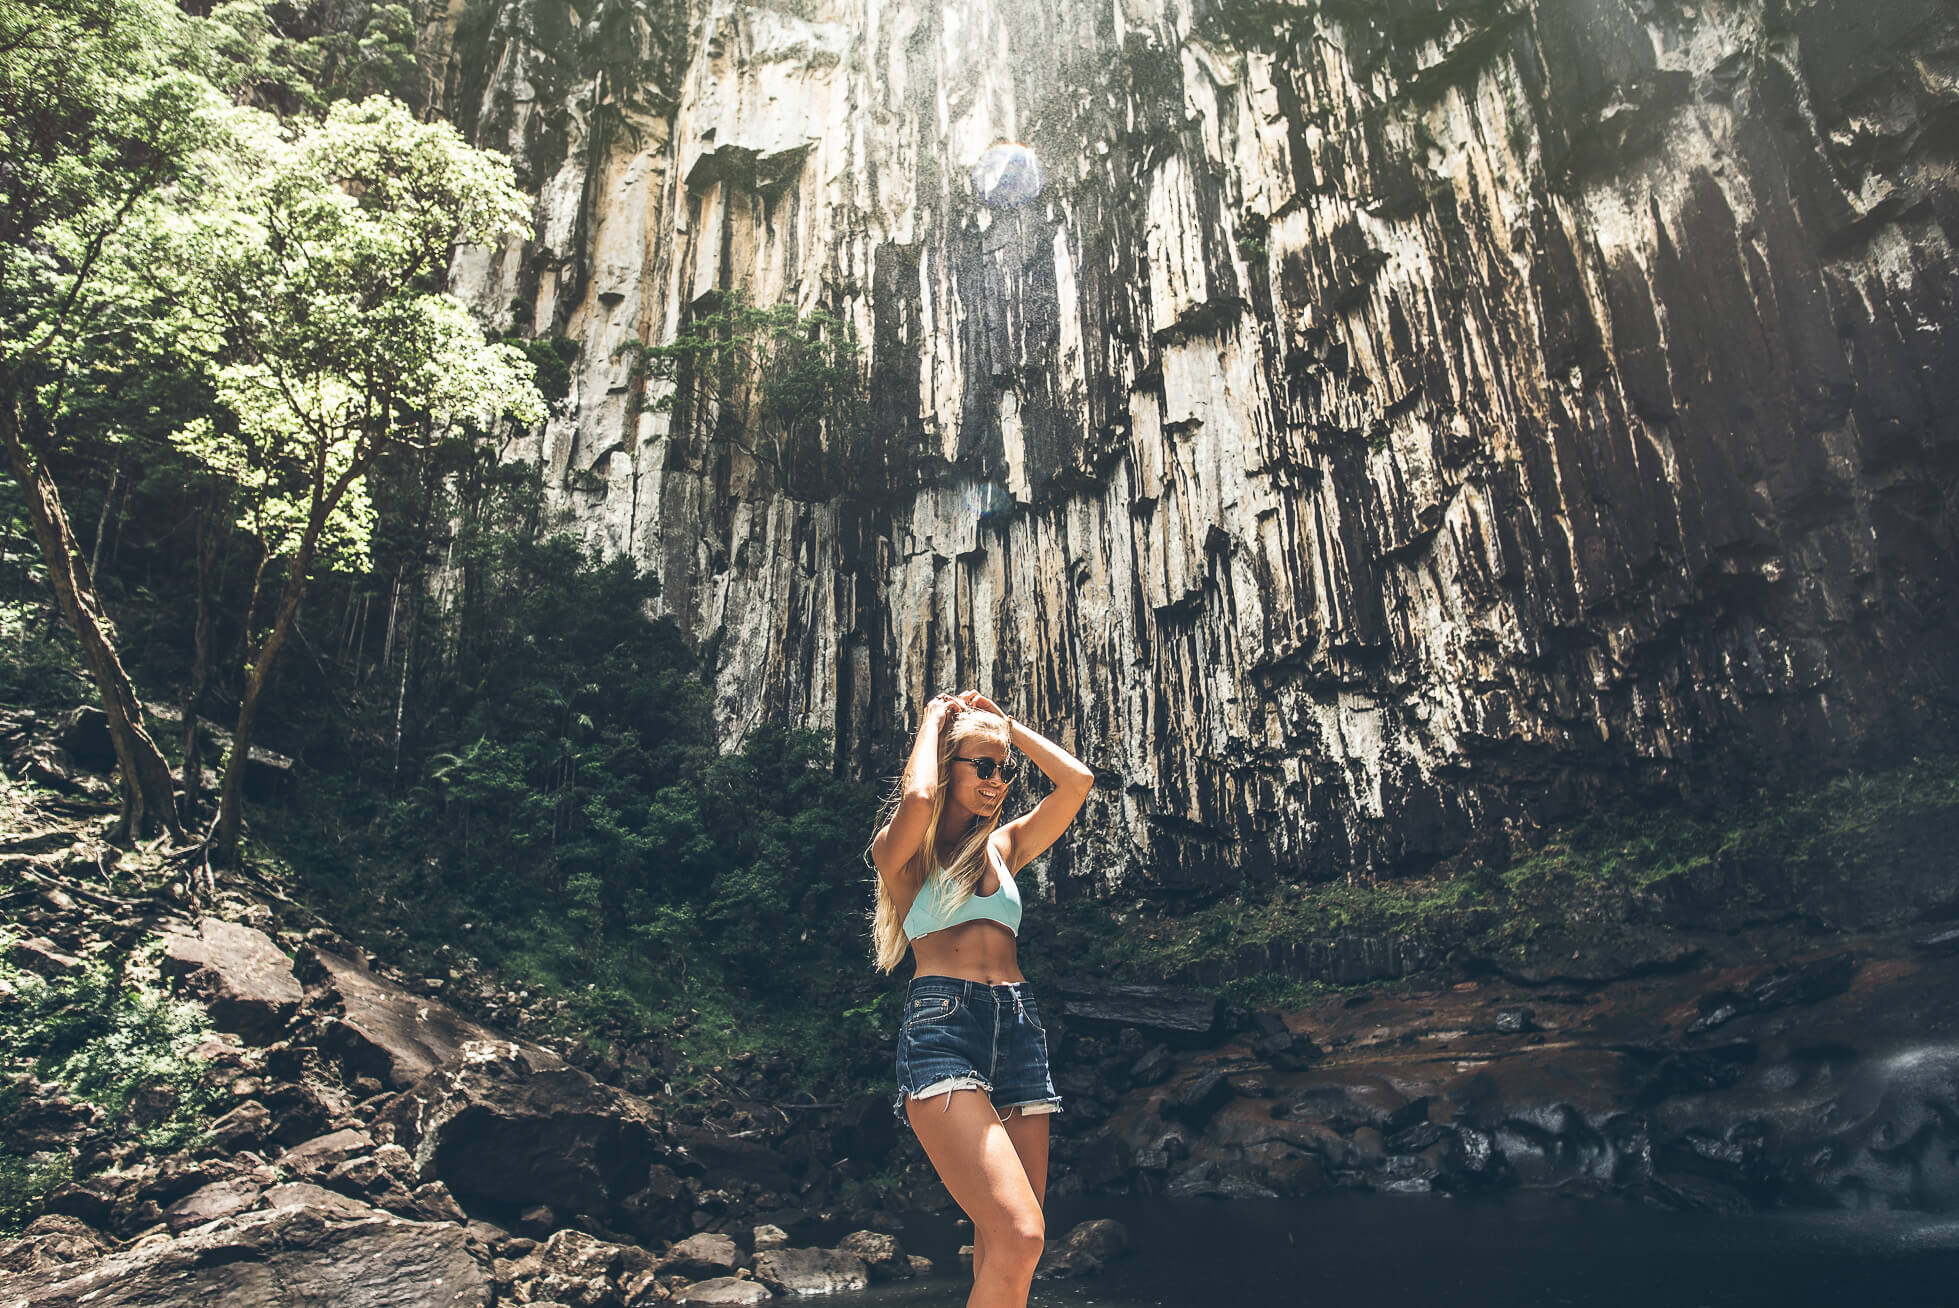 janni-deler-waterfall-hike-byronbayDSC_3401-Redigera